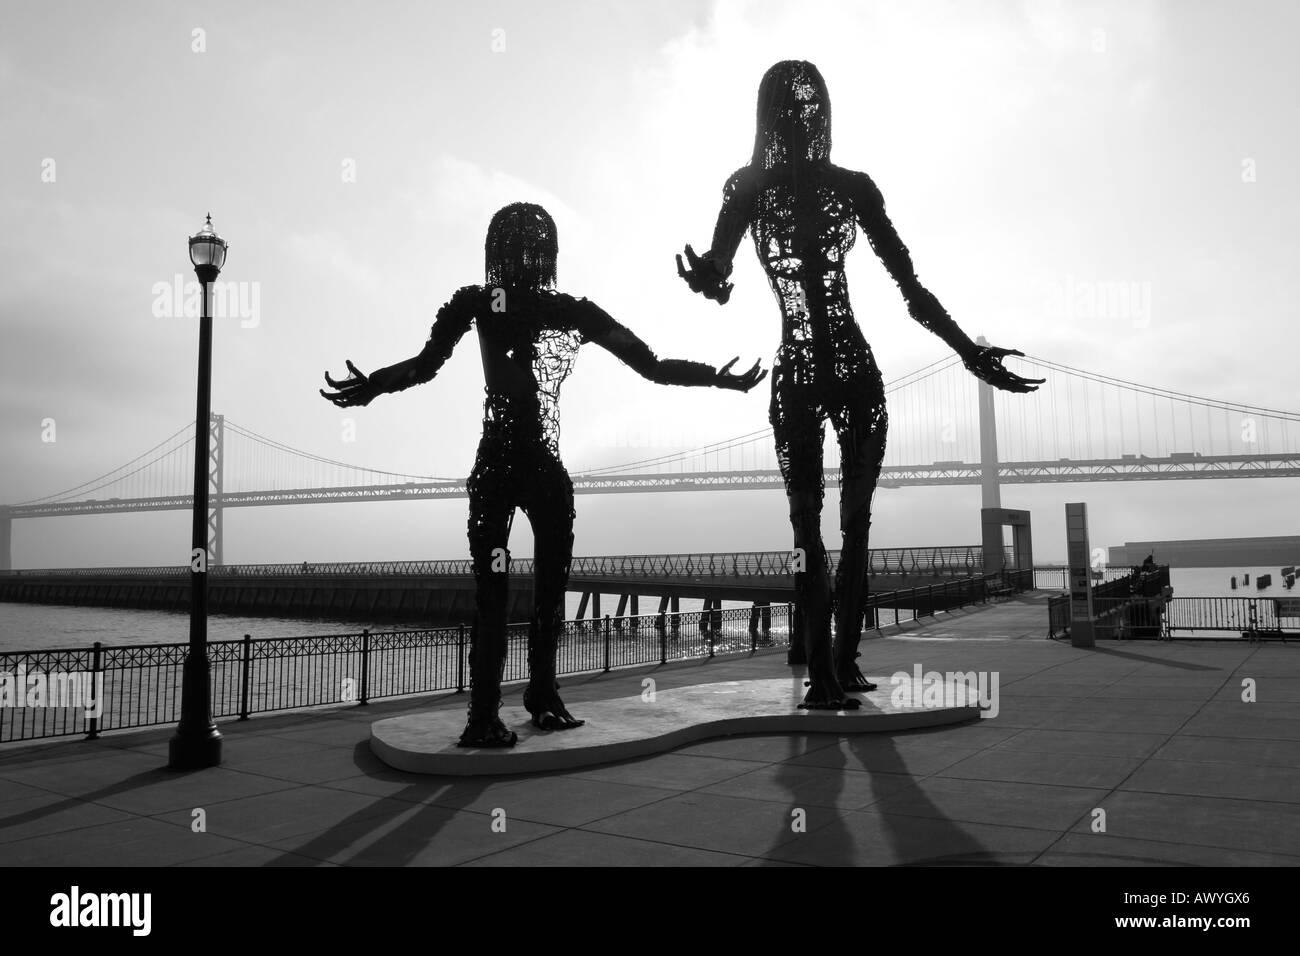 Silhouettes of 2 monumental sculptures, San Francisco, California, USA - Stock Image